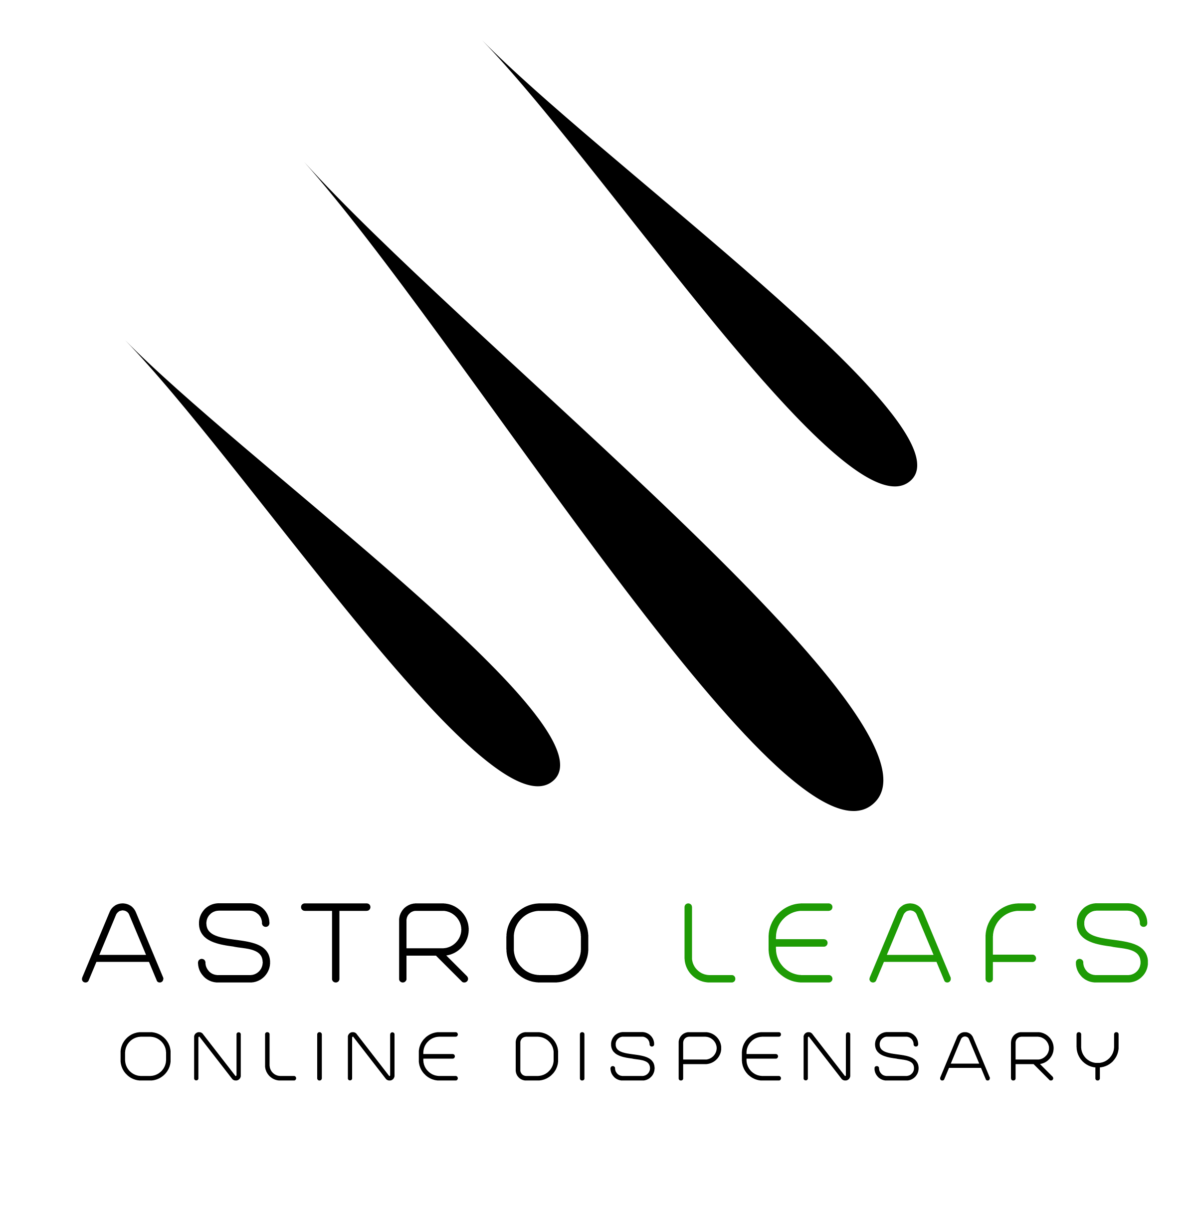 Astro Leafs